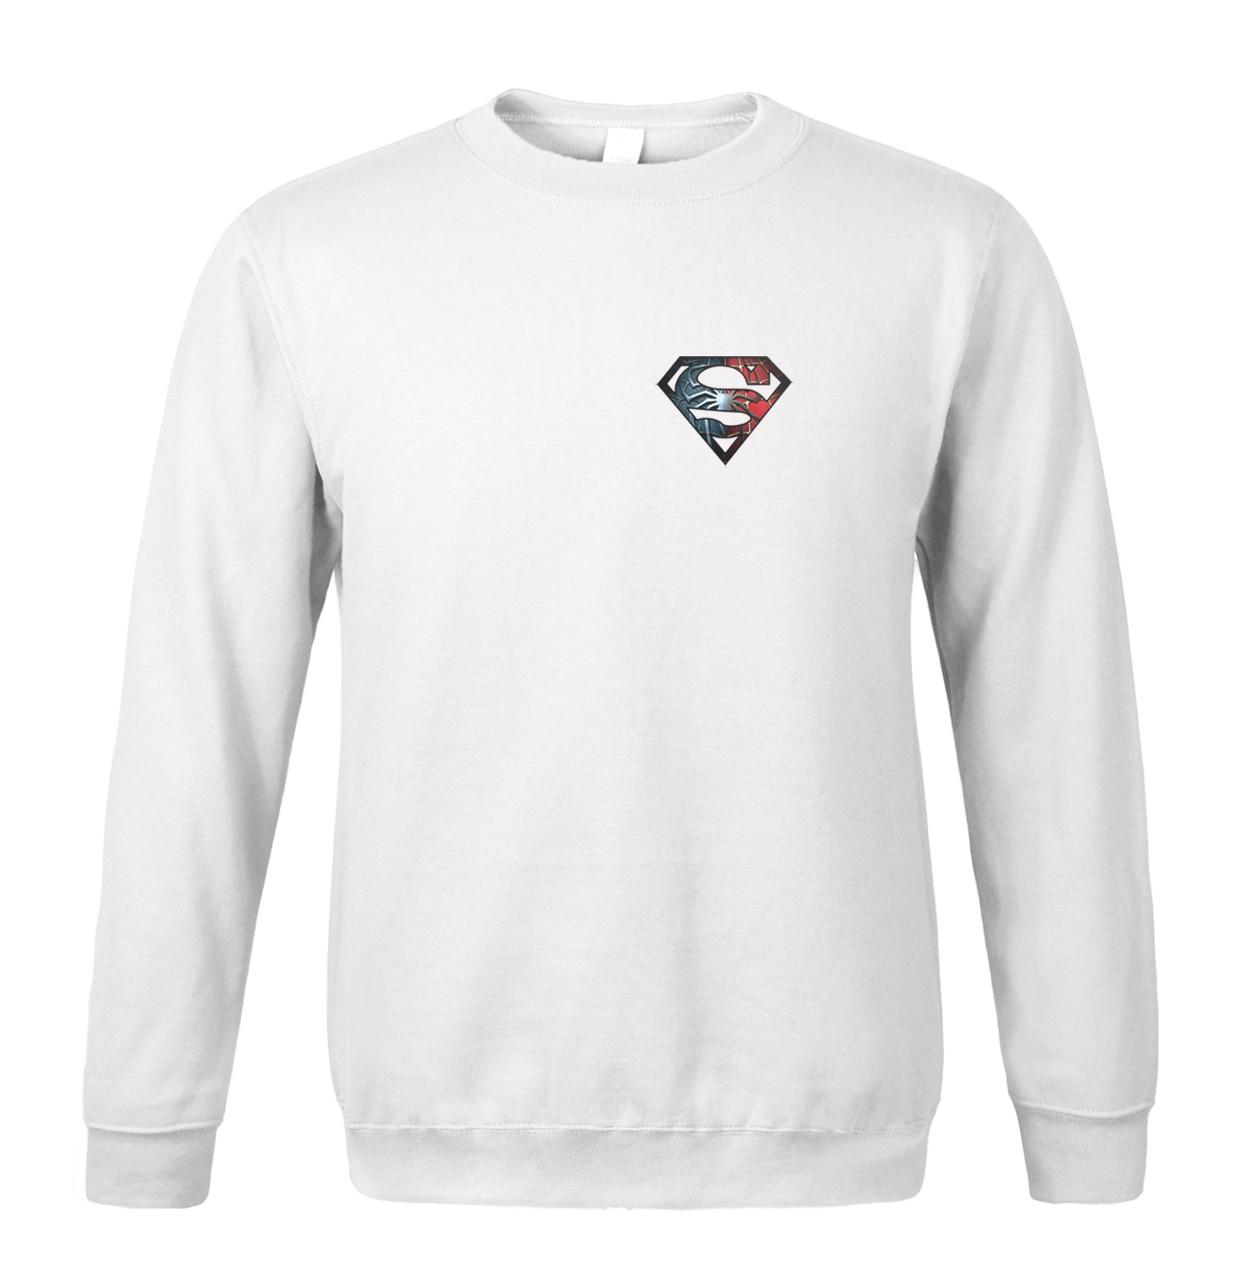 hot sale Superman sweatshirt 2018 spring winter fashion men hoodies fleece high quality brand clothing tracksuit men sportswear